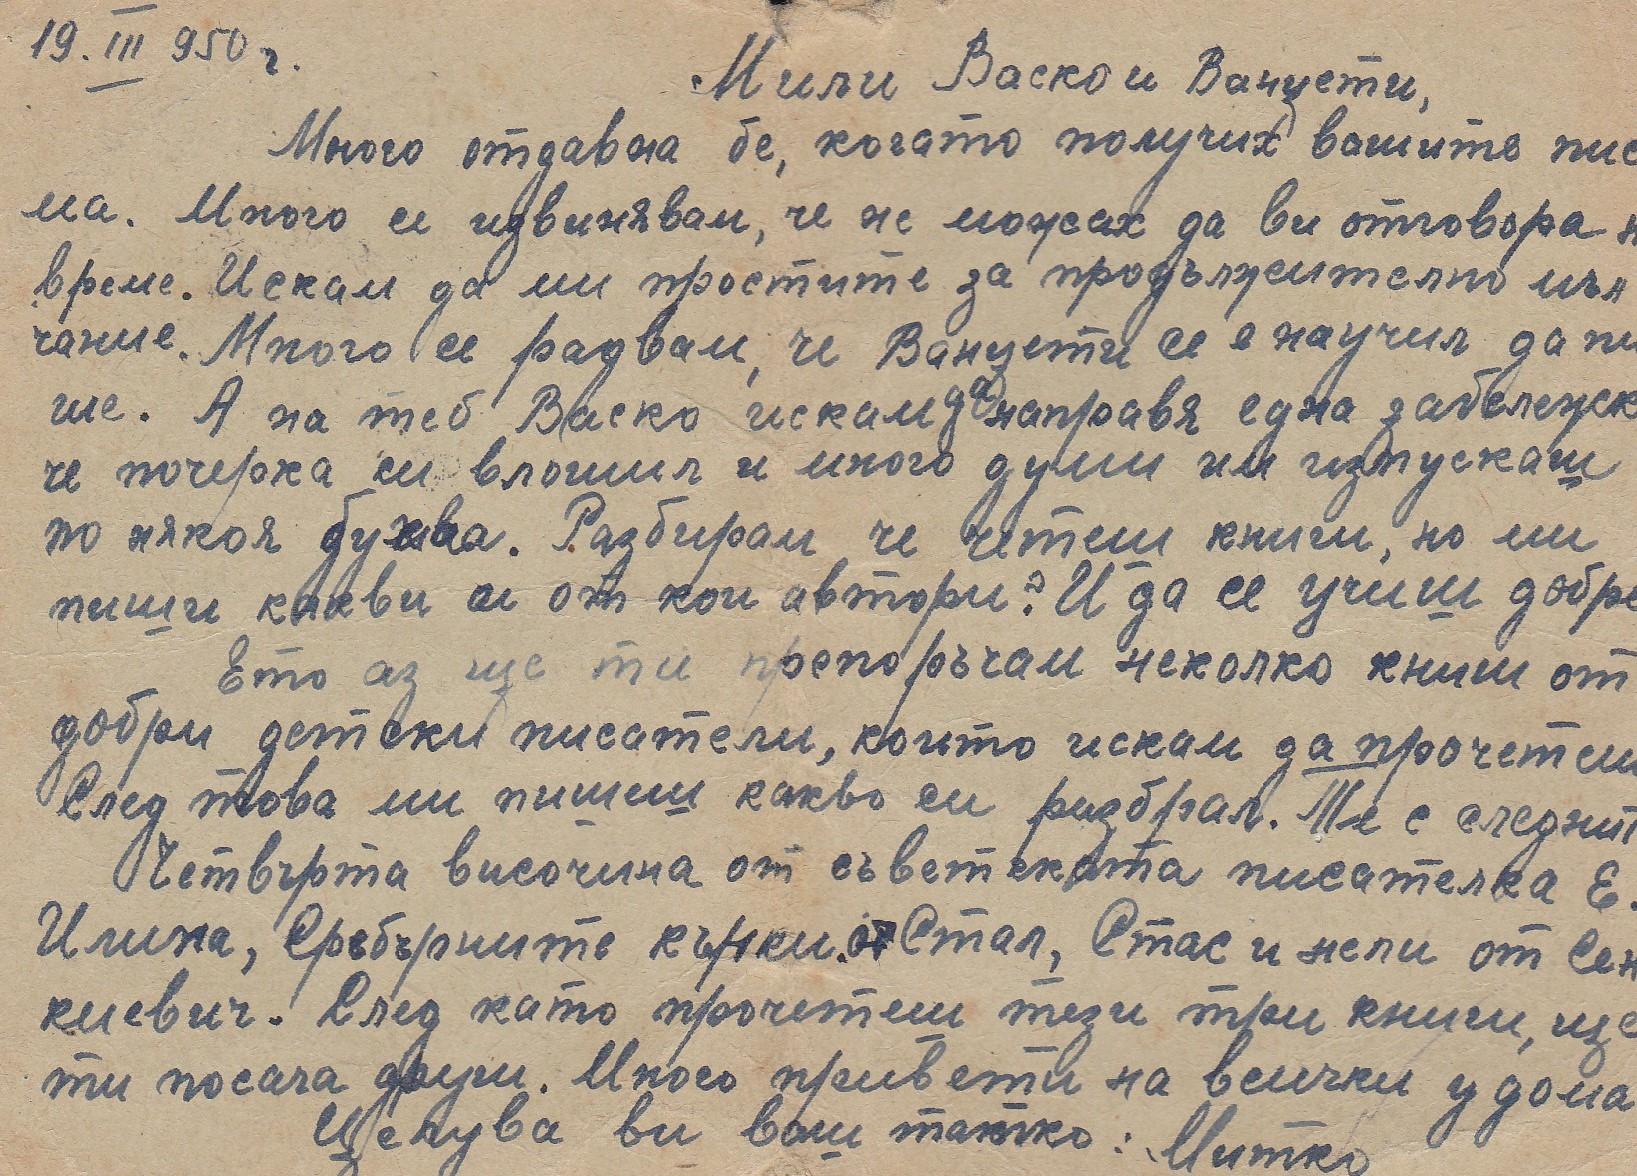 Letter of Dimitar Vasilev to his sons Vasil and Vantseti, written in Belene Forced Labour Camp in 1950.